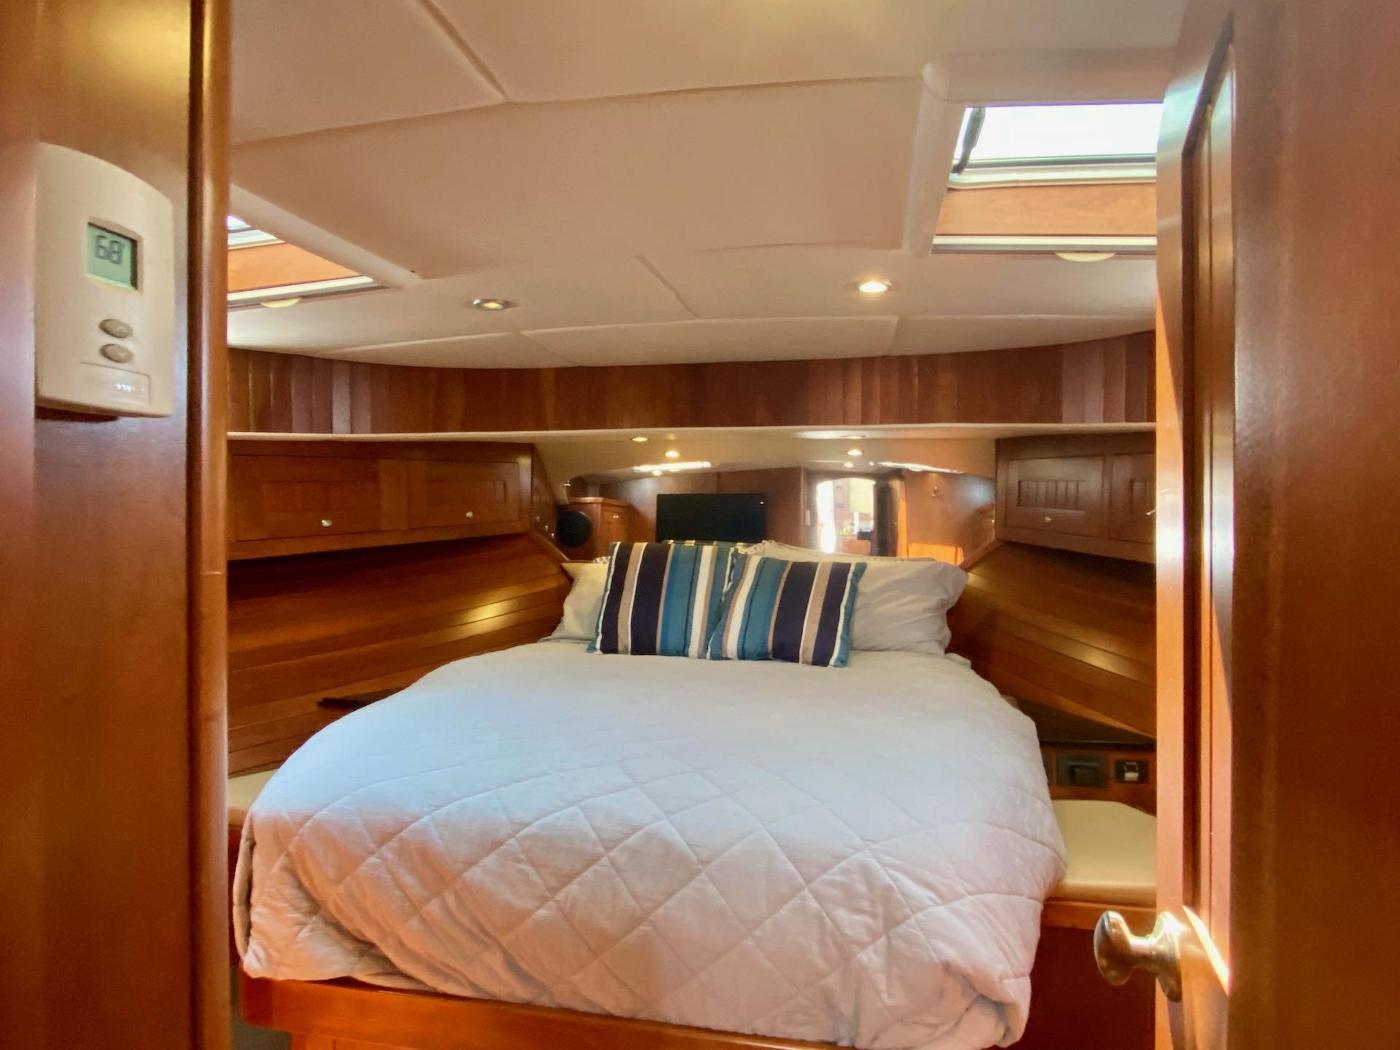 2010 Bracewell 41, Forward Cabin 3